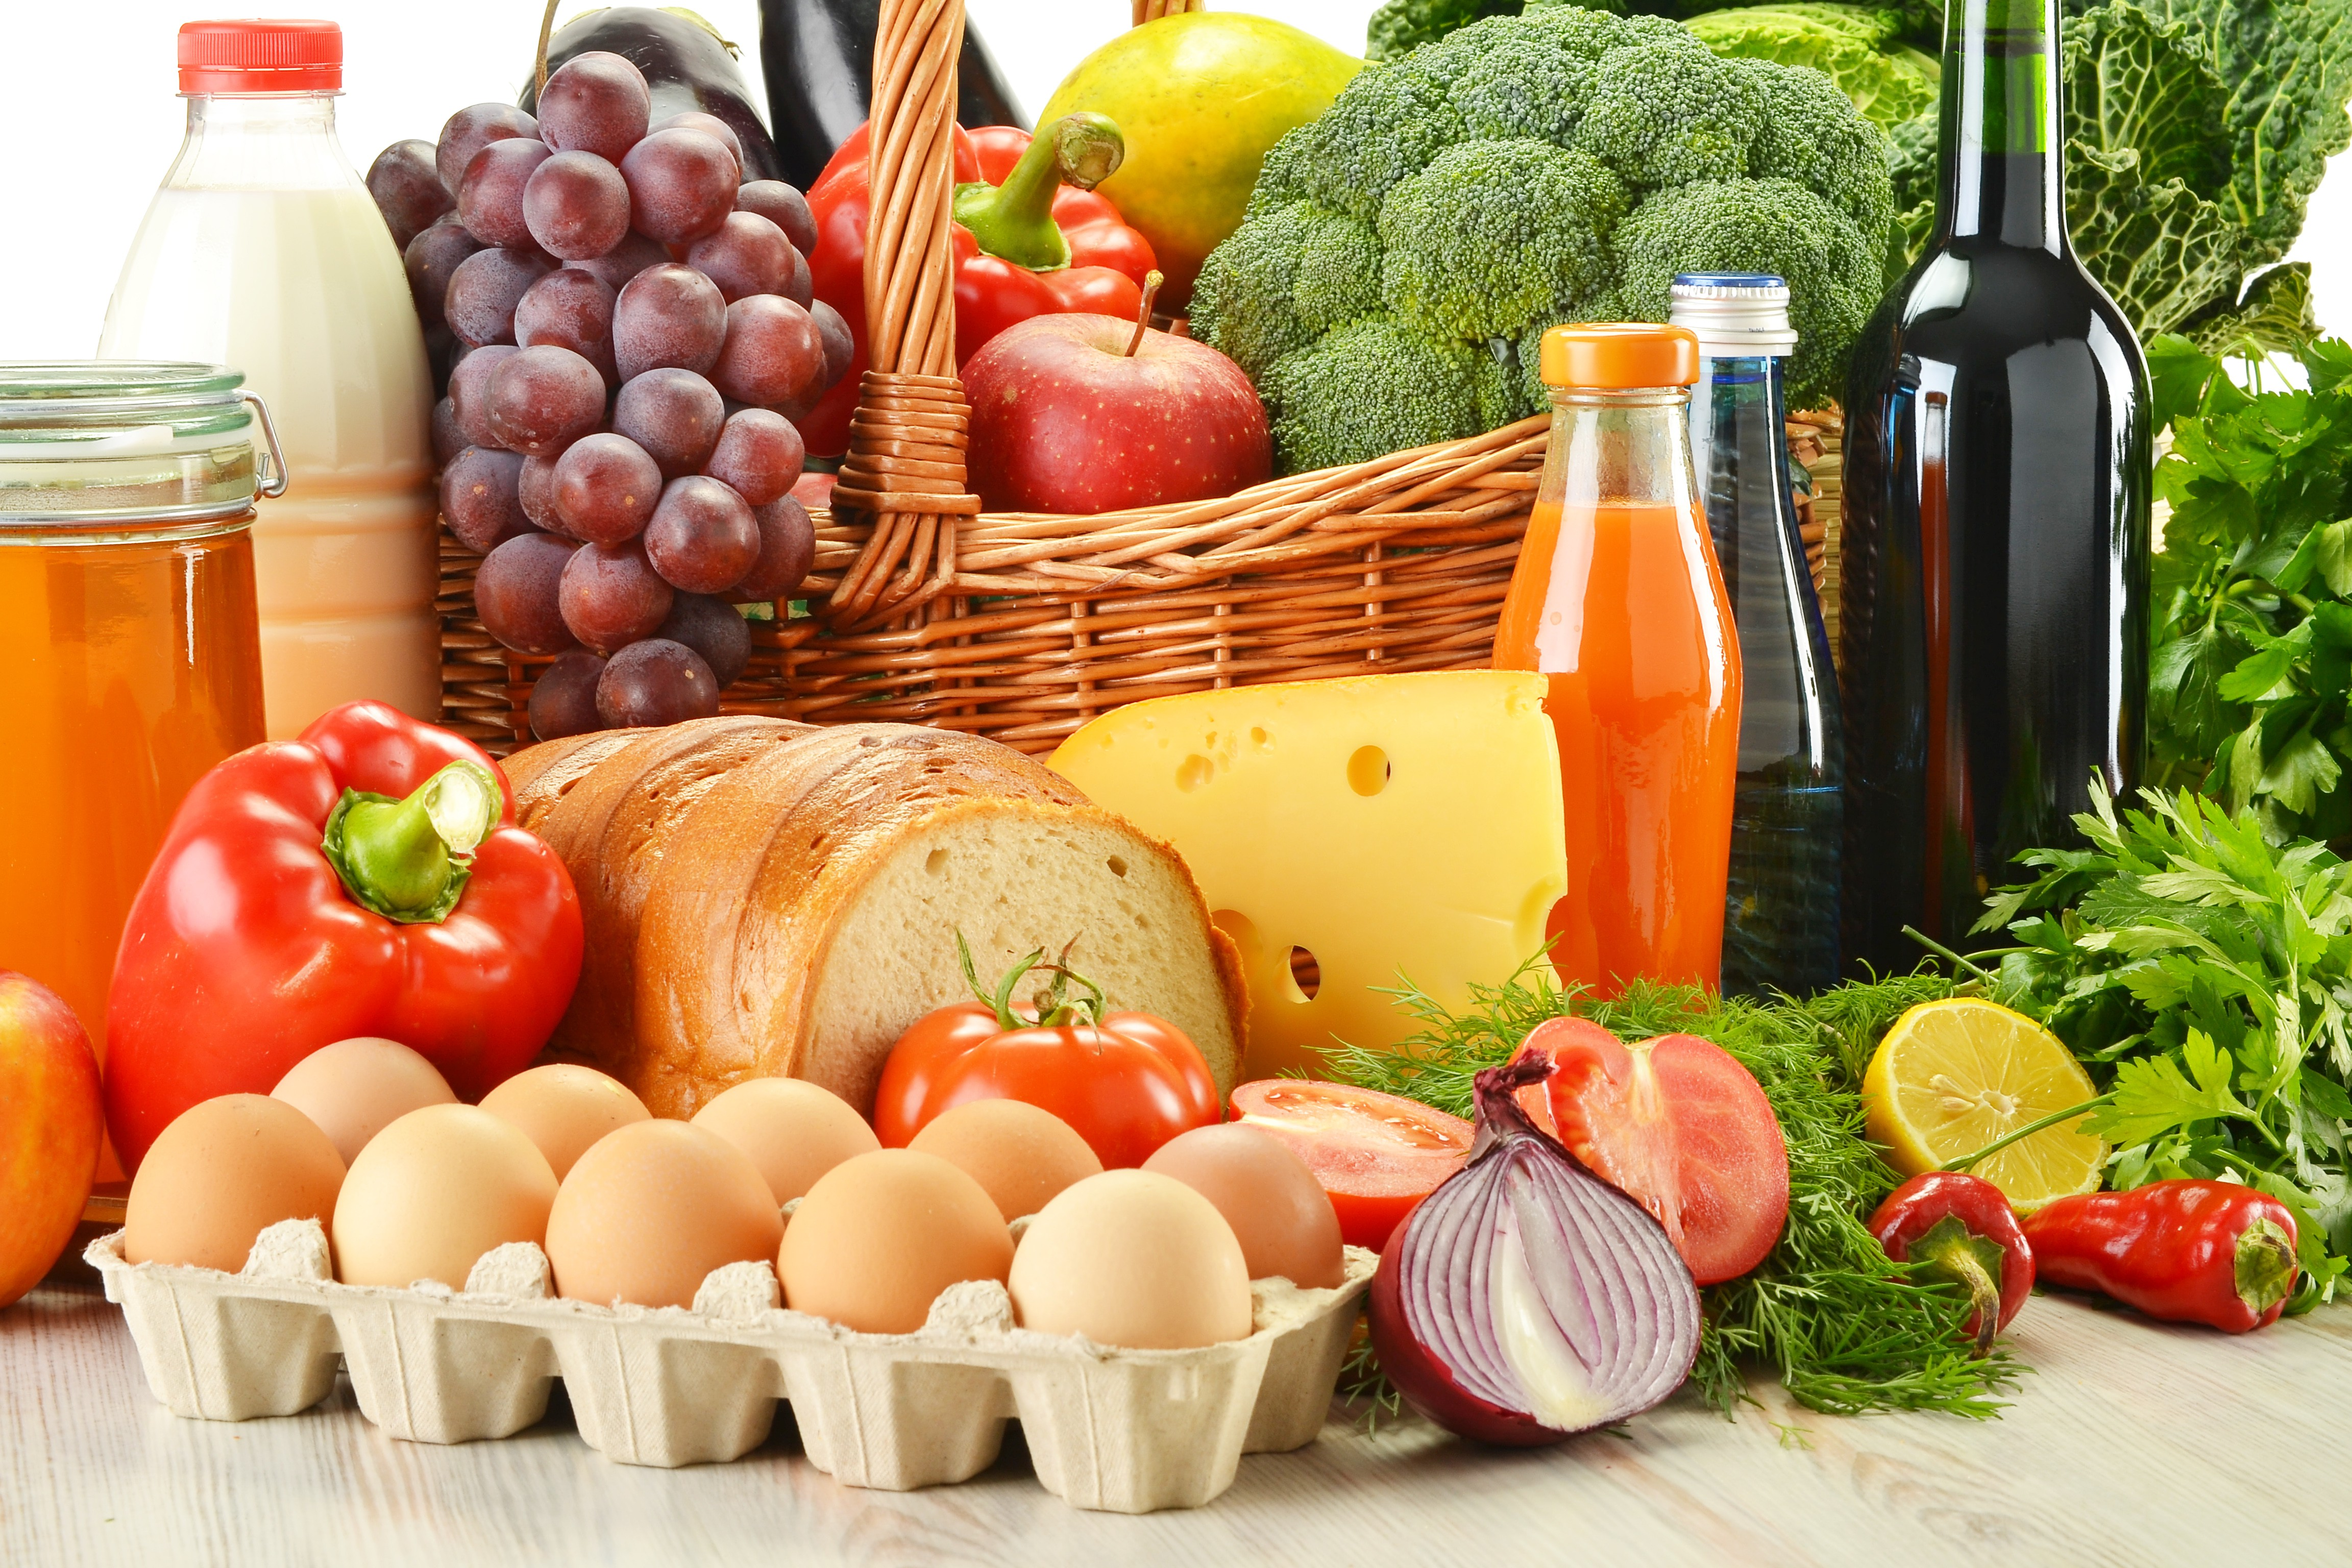 Статистика: в марте в Молдове подорожали овощи и фрукты, а подешевели яйца